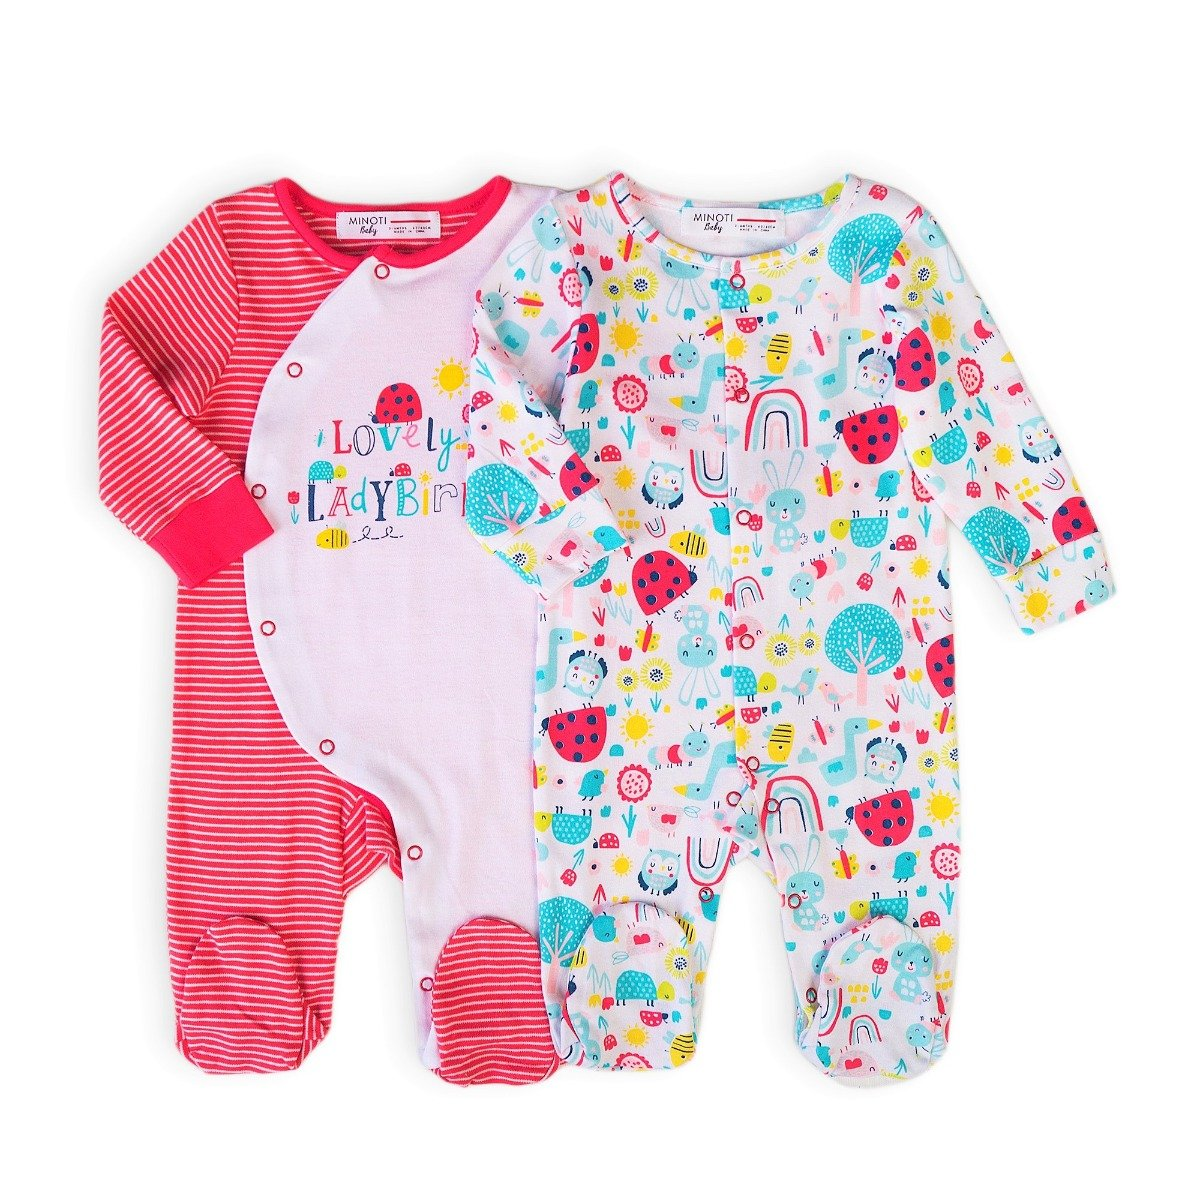 Set 2 bucati salopeta bebe Minoti Ladybug imagine